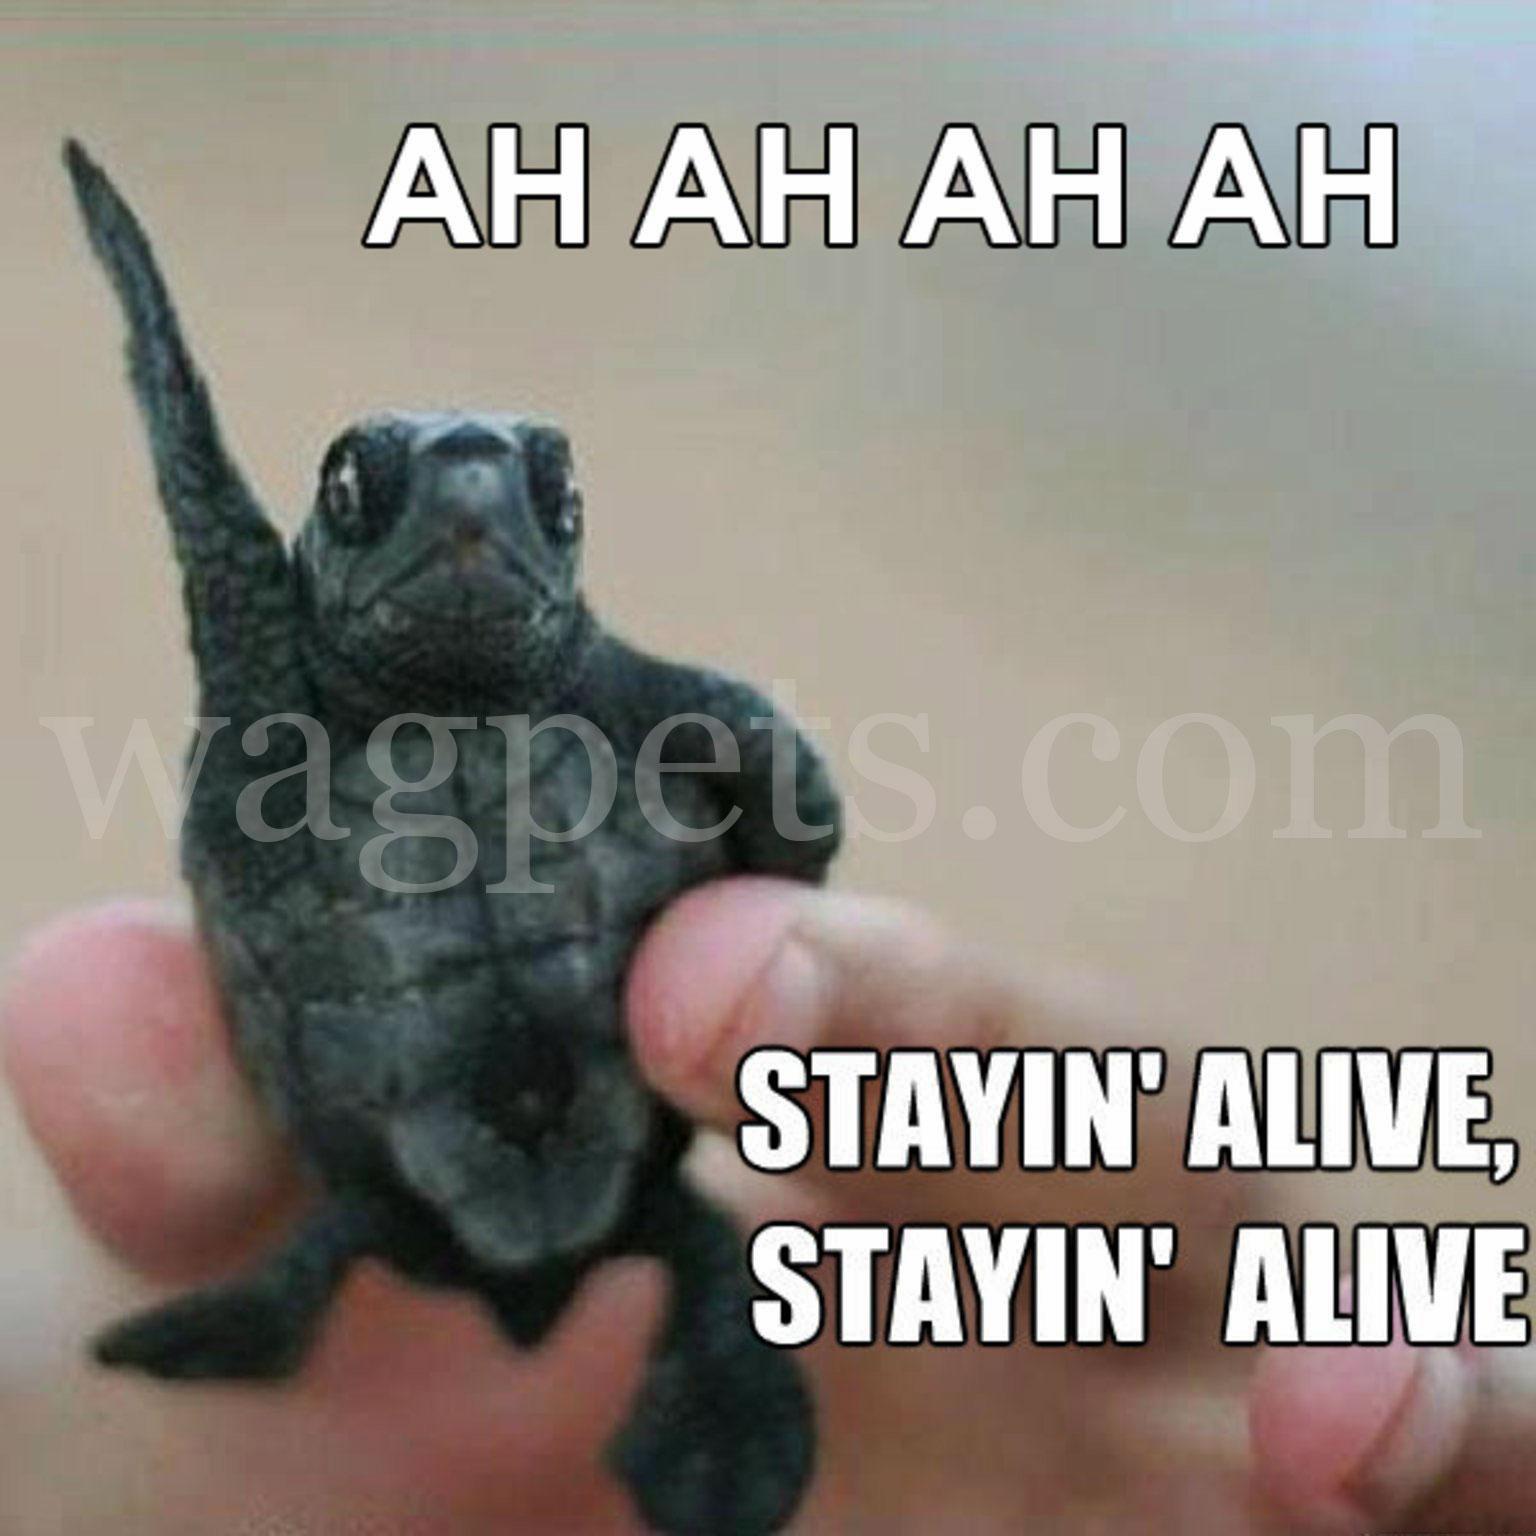 AH AH AH AH Stayin' alive Stayin' alive